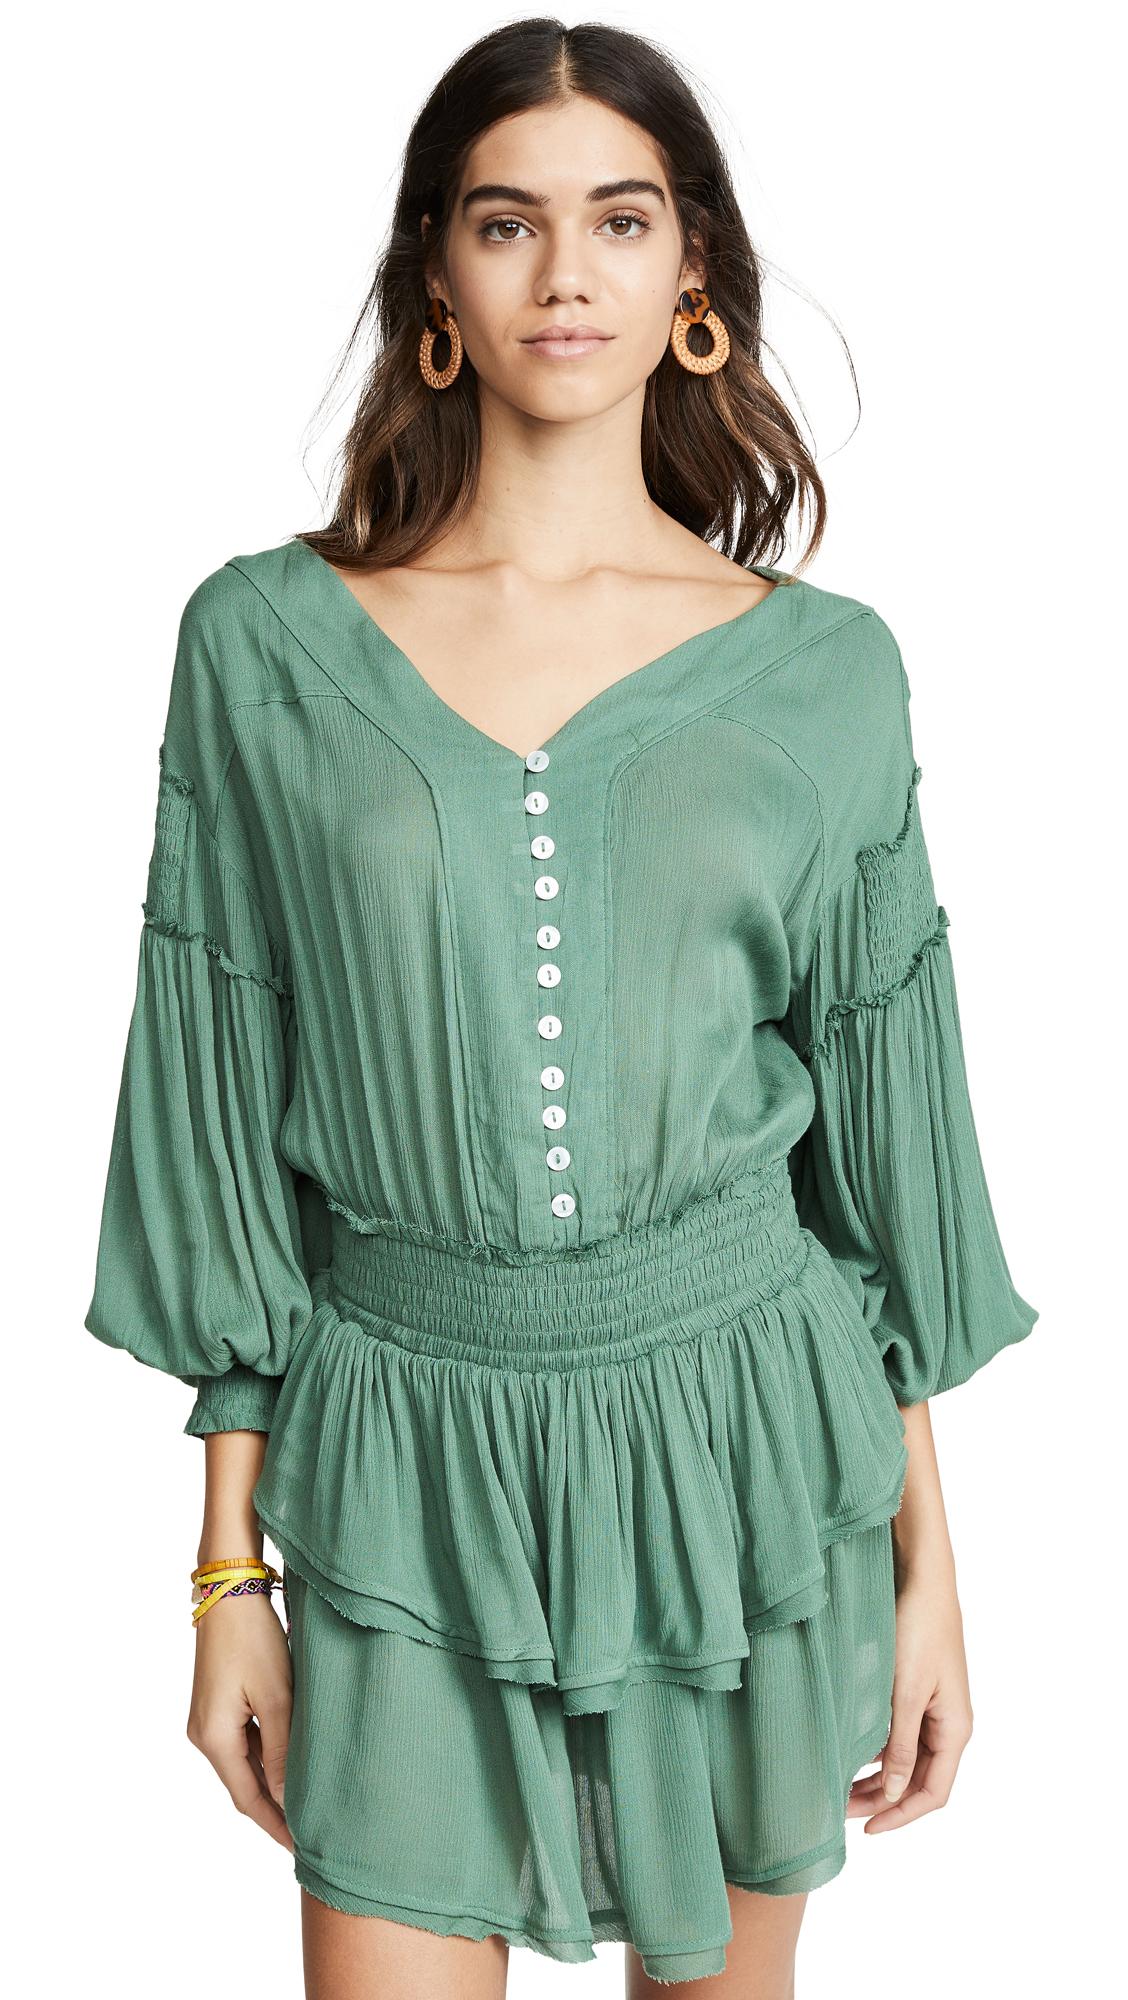 Free People The Romy Mini Dress - Green